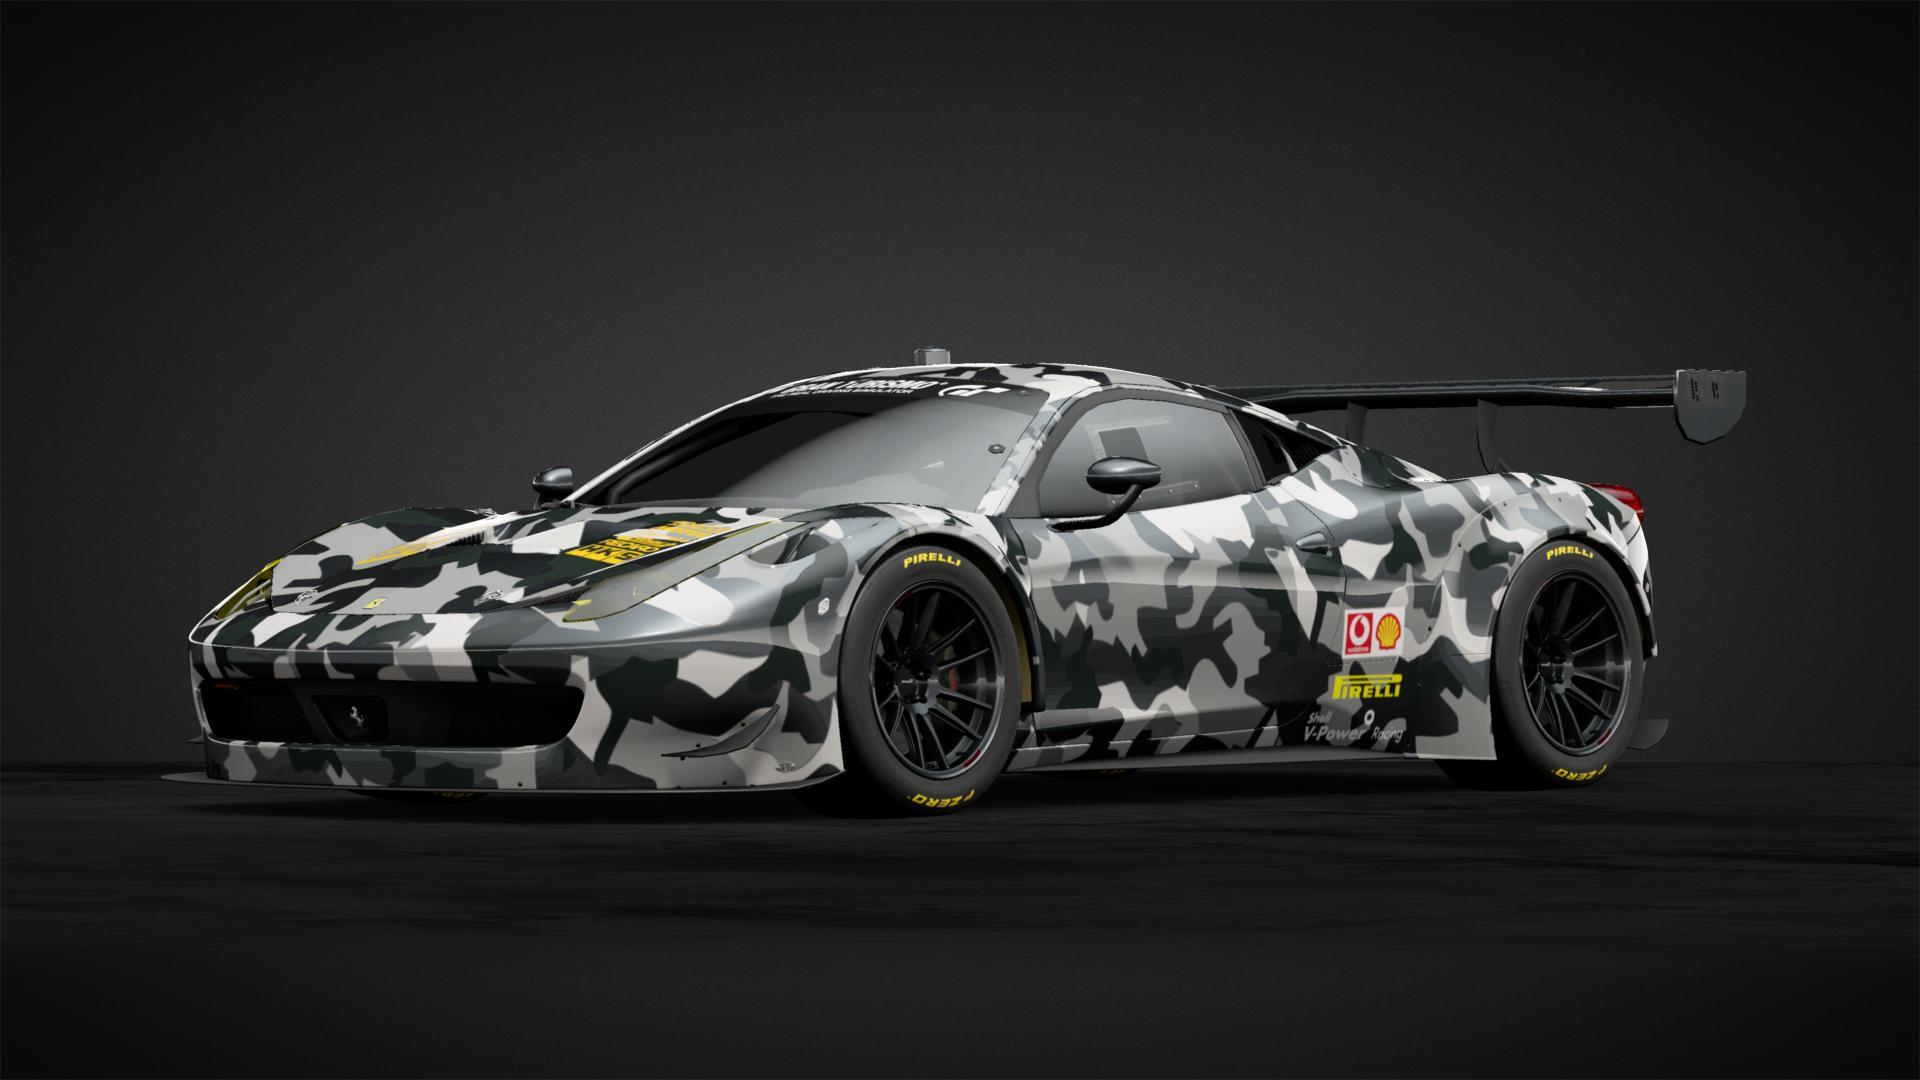 Ferrari 458 Gt3 Grey Camouflage Car Livery By Joper88 Community Gran Turismo Sport